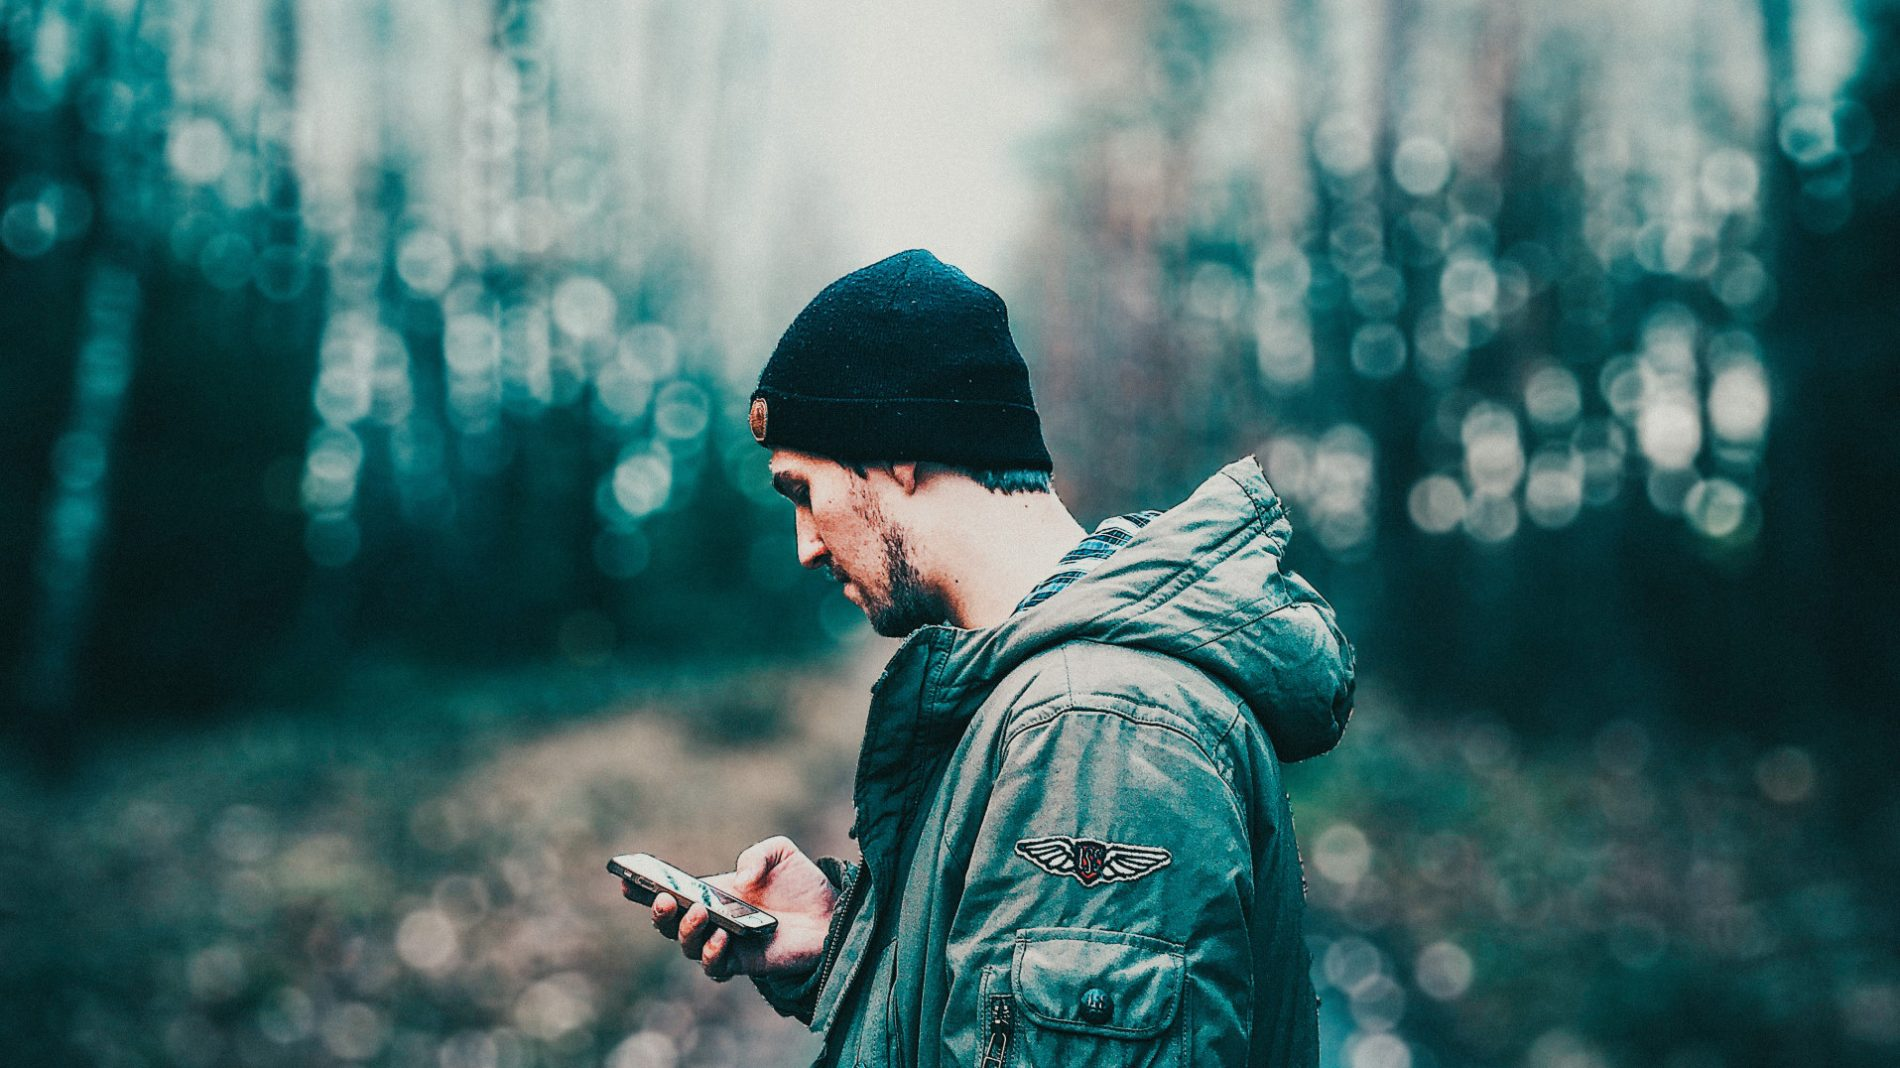 Young man looking at social media on his phone